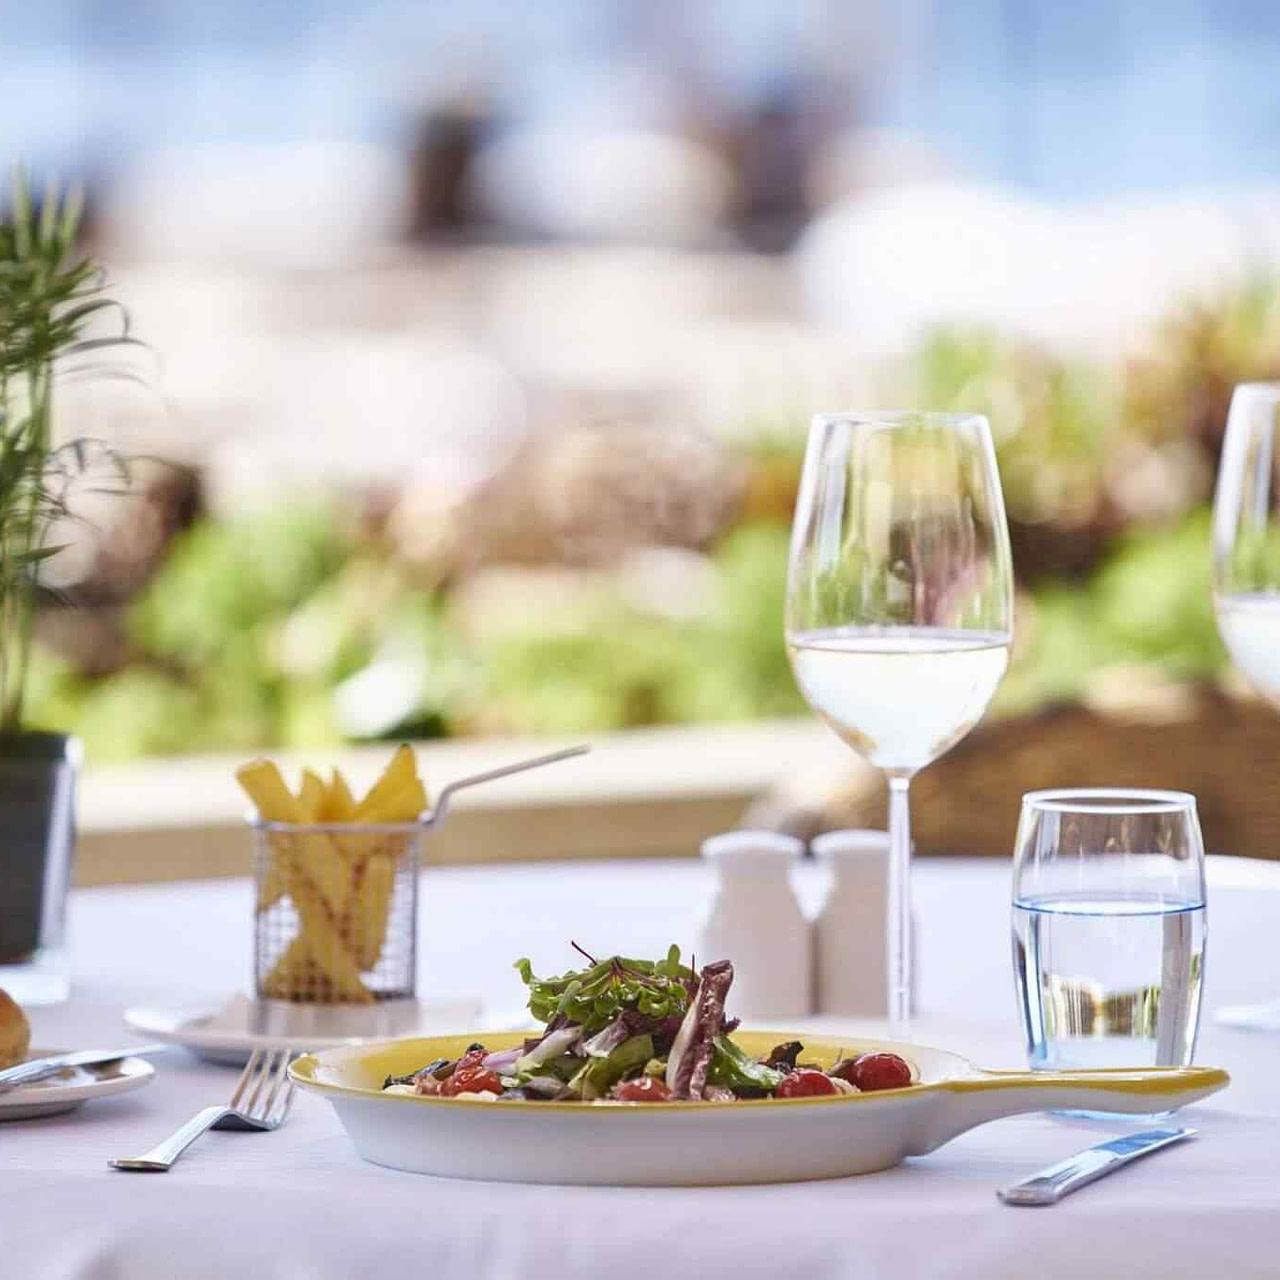 https://mlohvc80vfmp.i.optimole.com/KzqGvII-HQY4PVJz/w:1280/h:1280/q:90/rt:fill/g:ce/https://www.apperitivo-directory.beer/wp-content/uploads/2017/08/restaurant-01-6.jpg